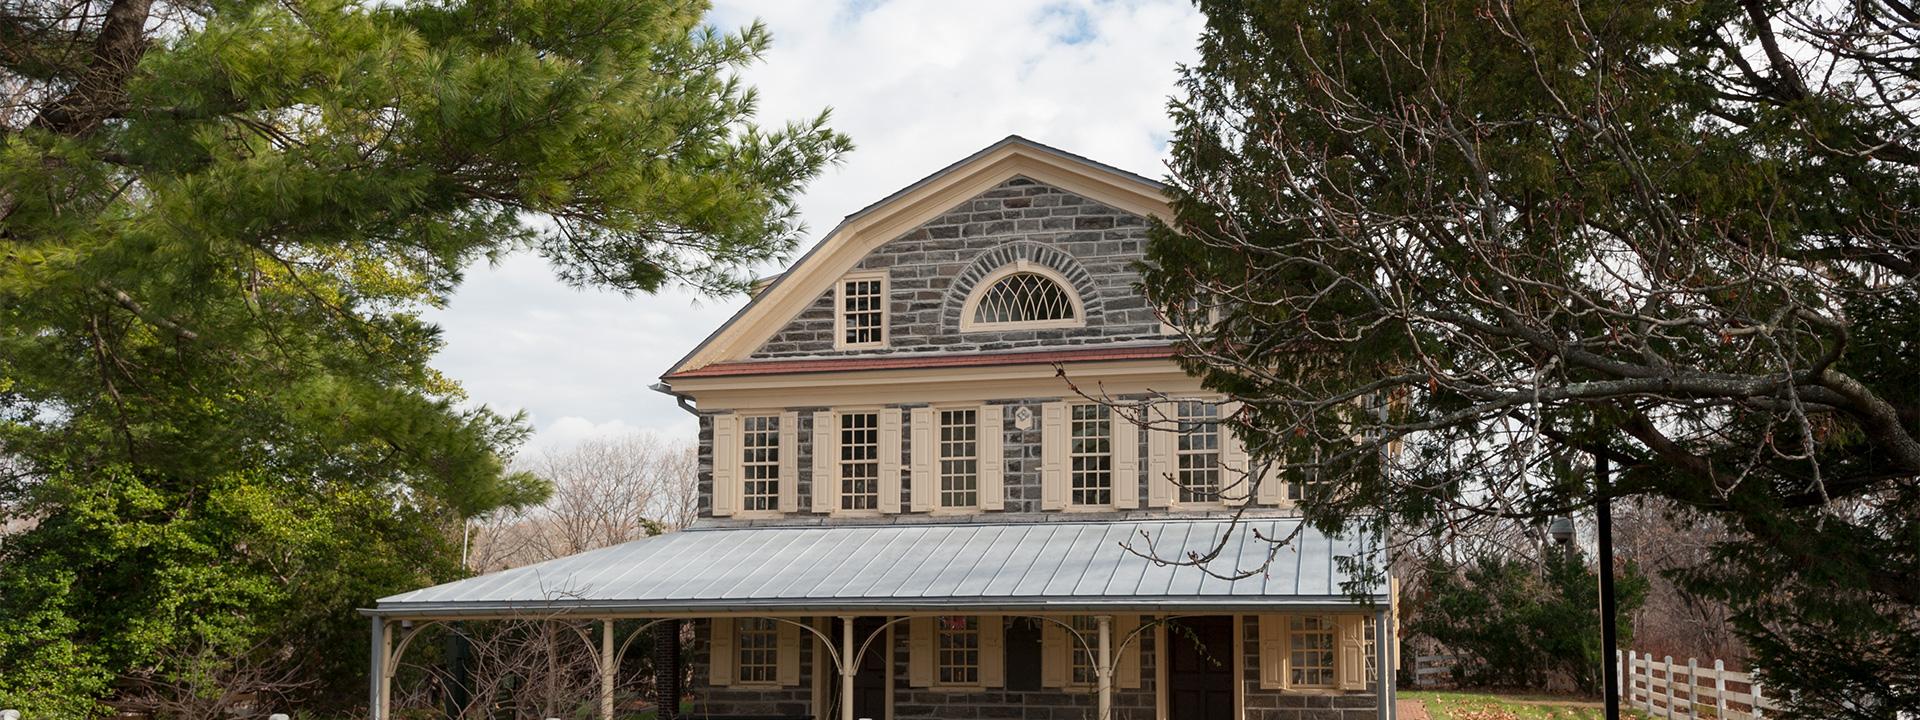 Exterior view of Cedar Grove historic house